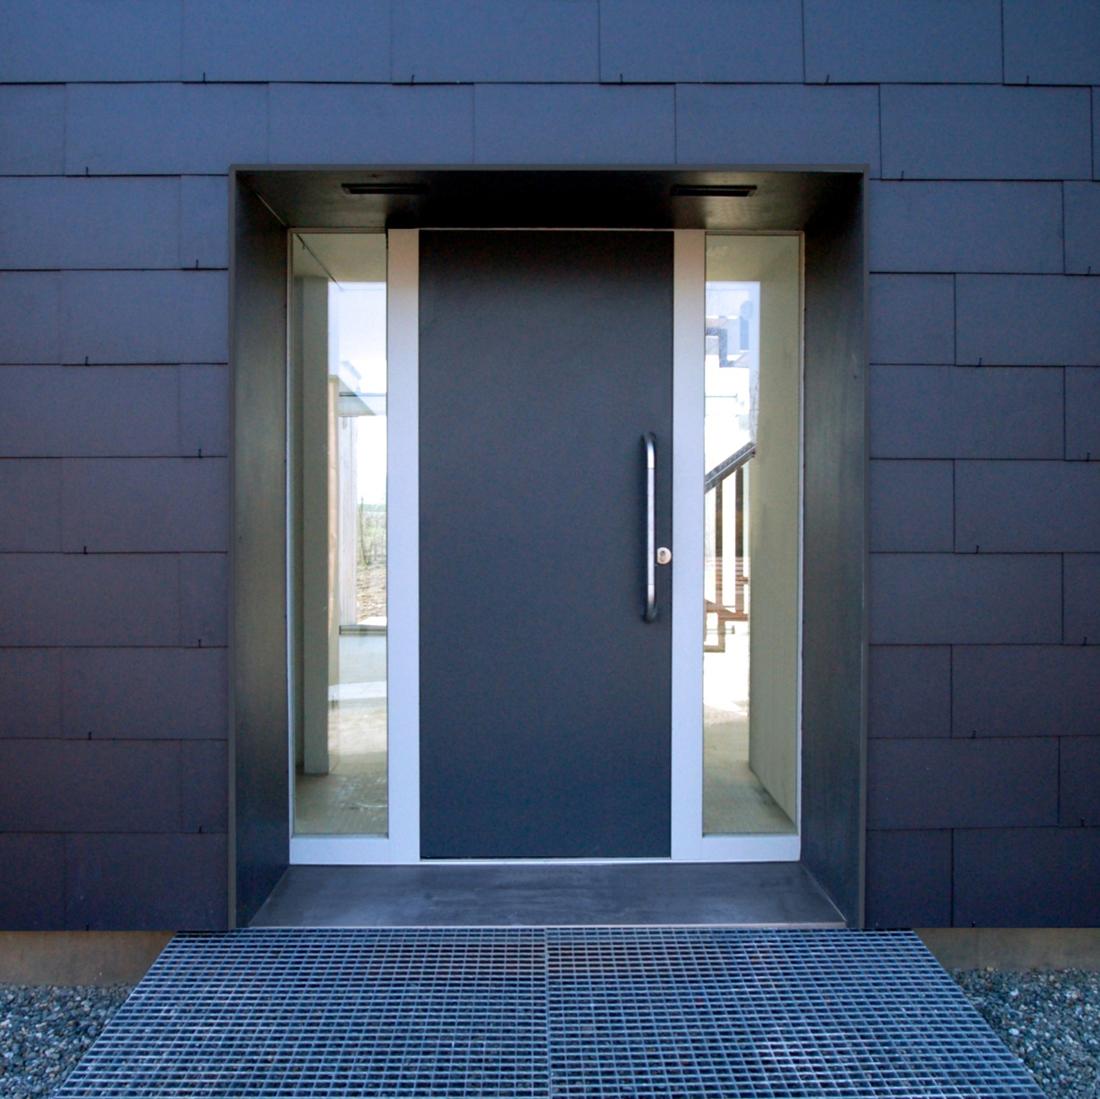 06-entrance-phot-p-kuczia 06-entrance-phot-p-kuczia